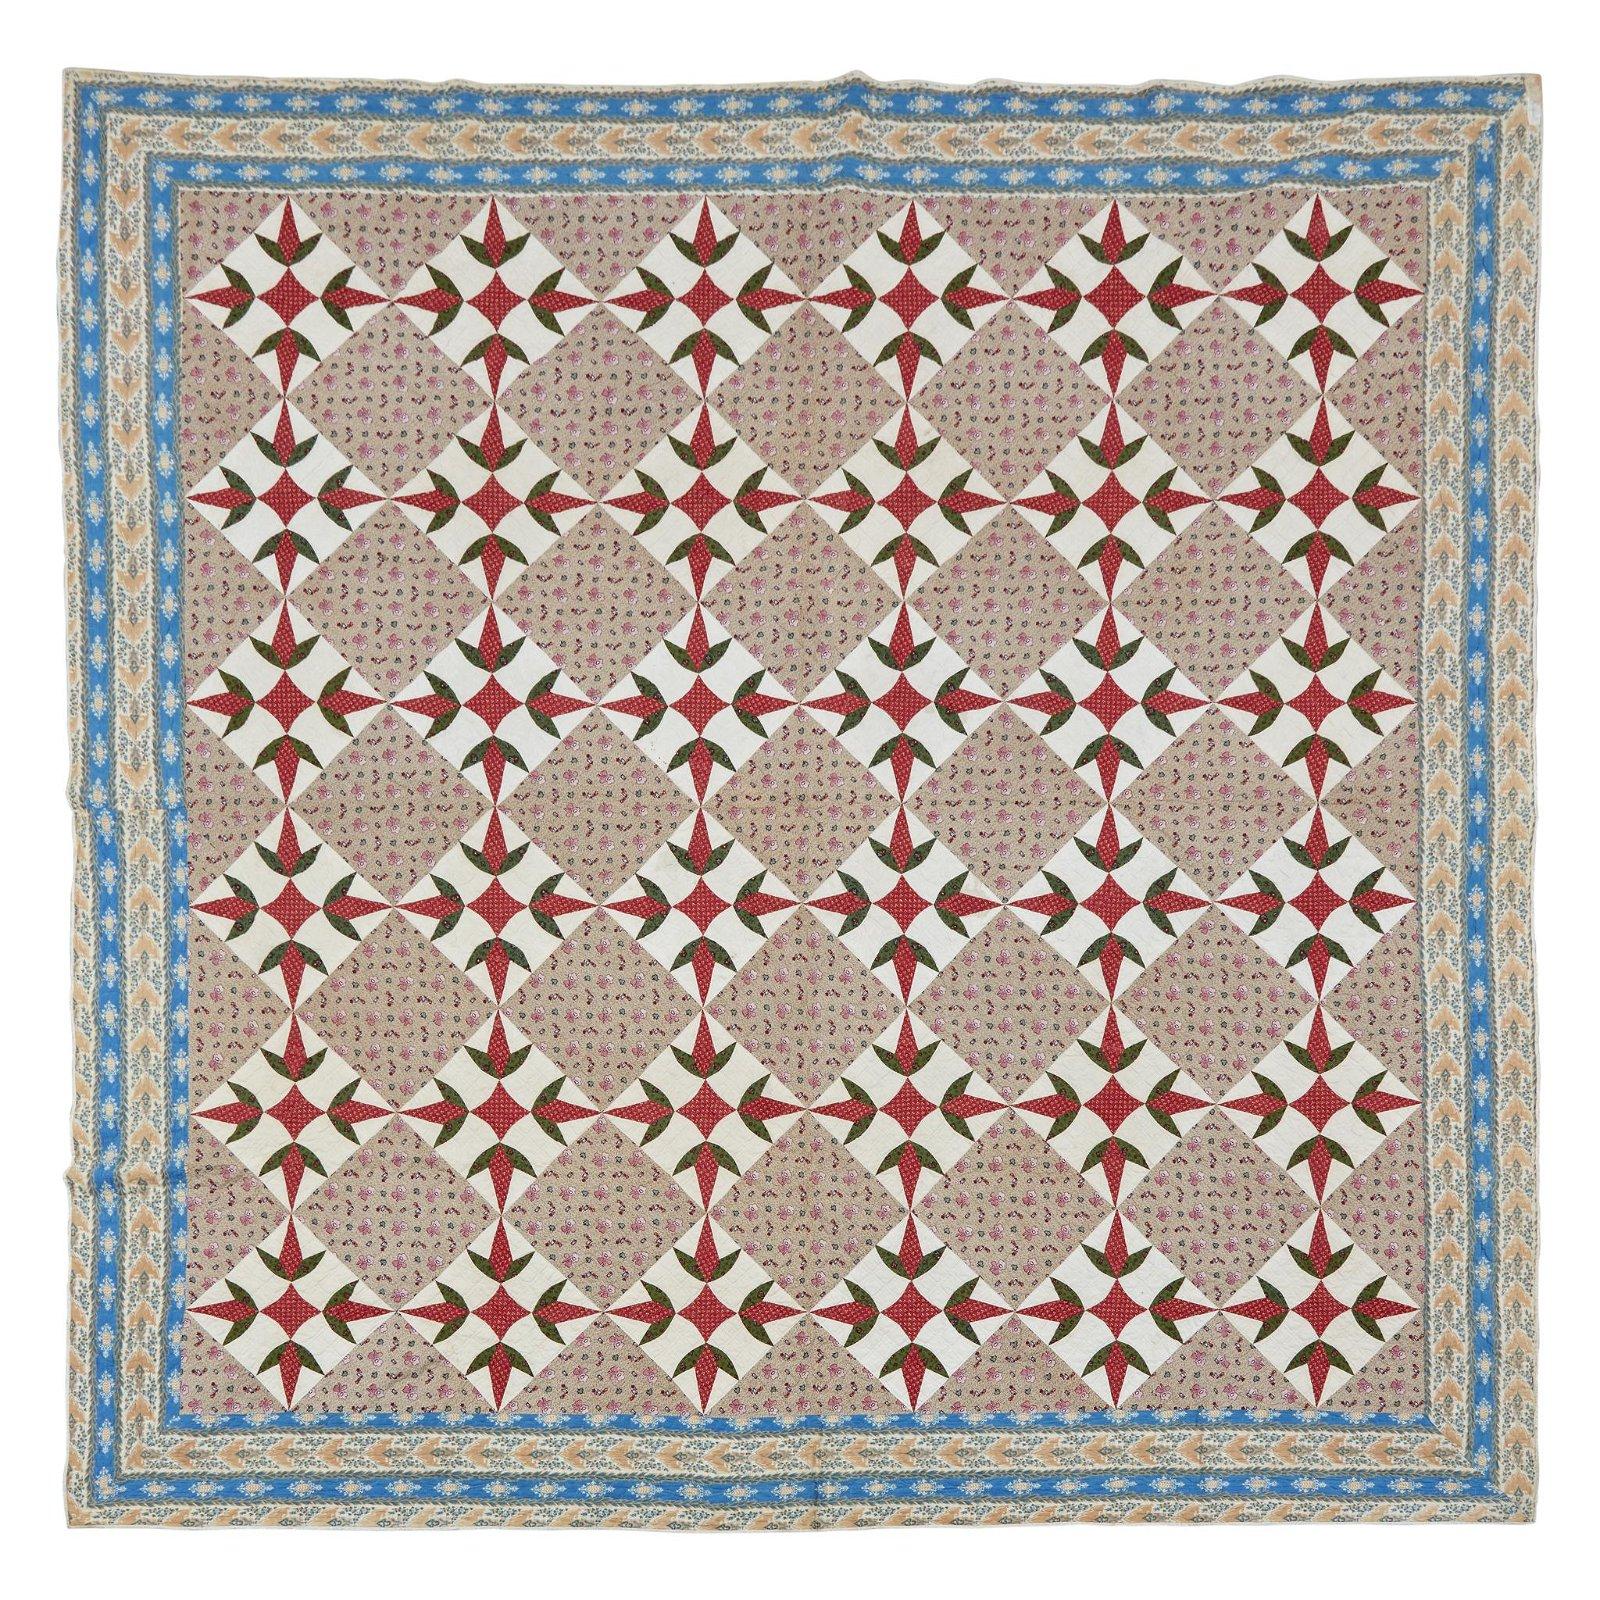 "Pieced ""Turkey Tracks"" pattern quilt, second half 19th"